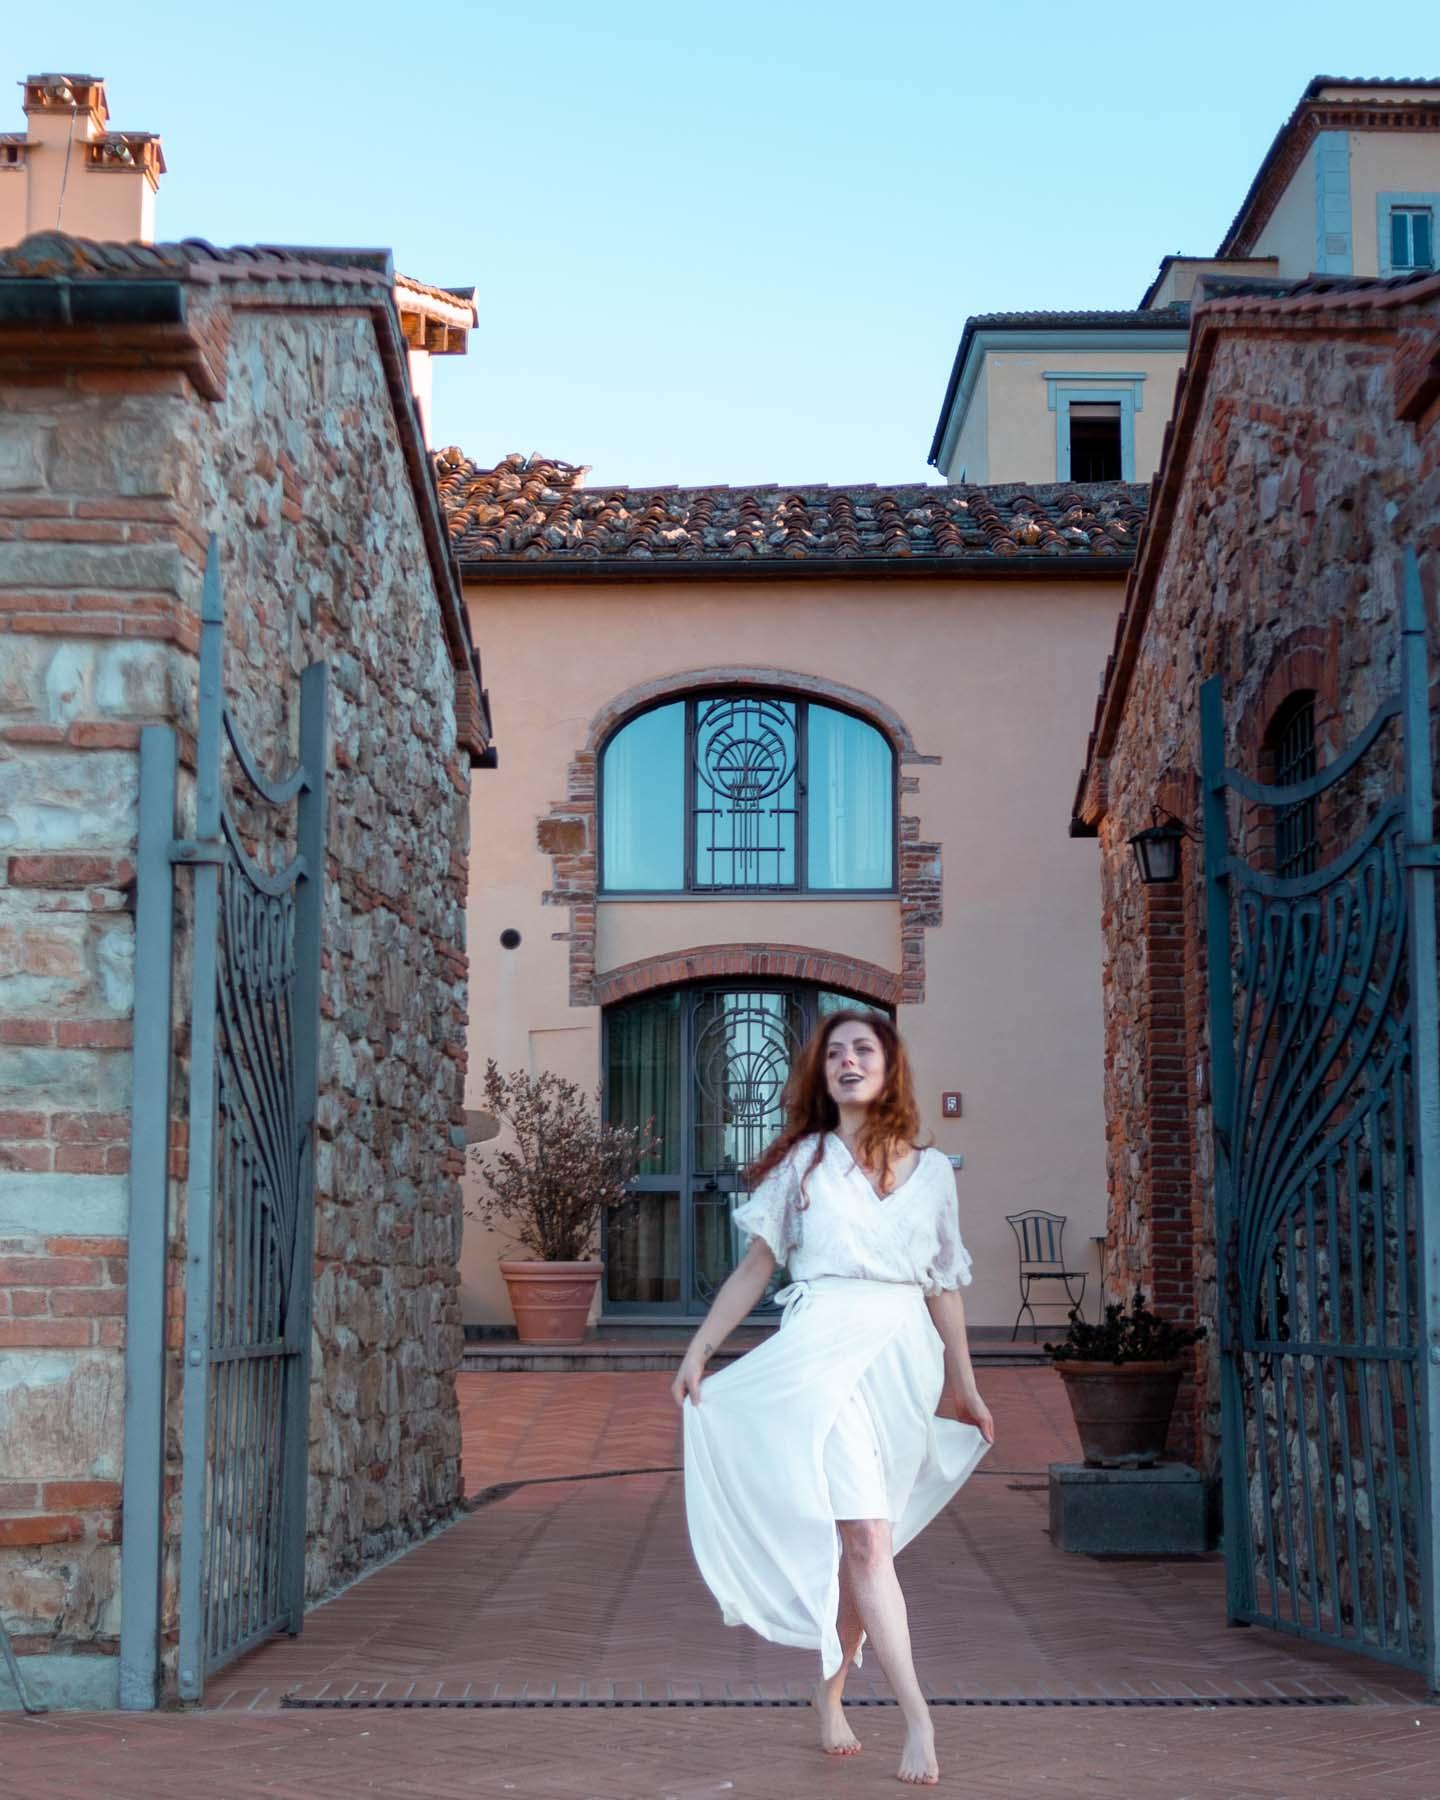 borgo antico casalbosco ingresso casa vacanze